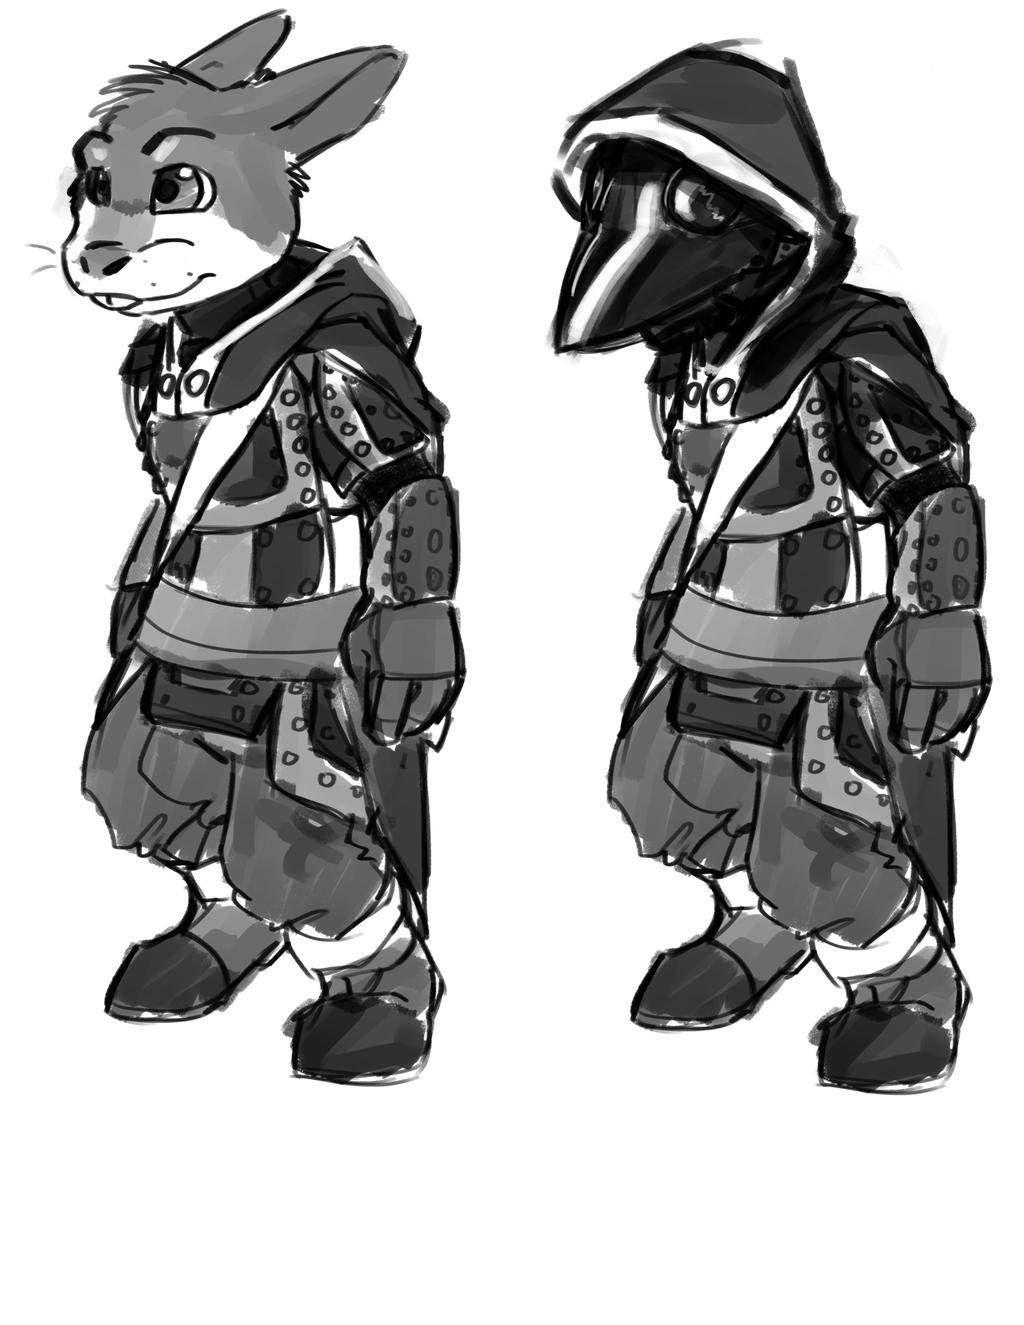 Pathfinder PC - Bunny Plague Doctor?